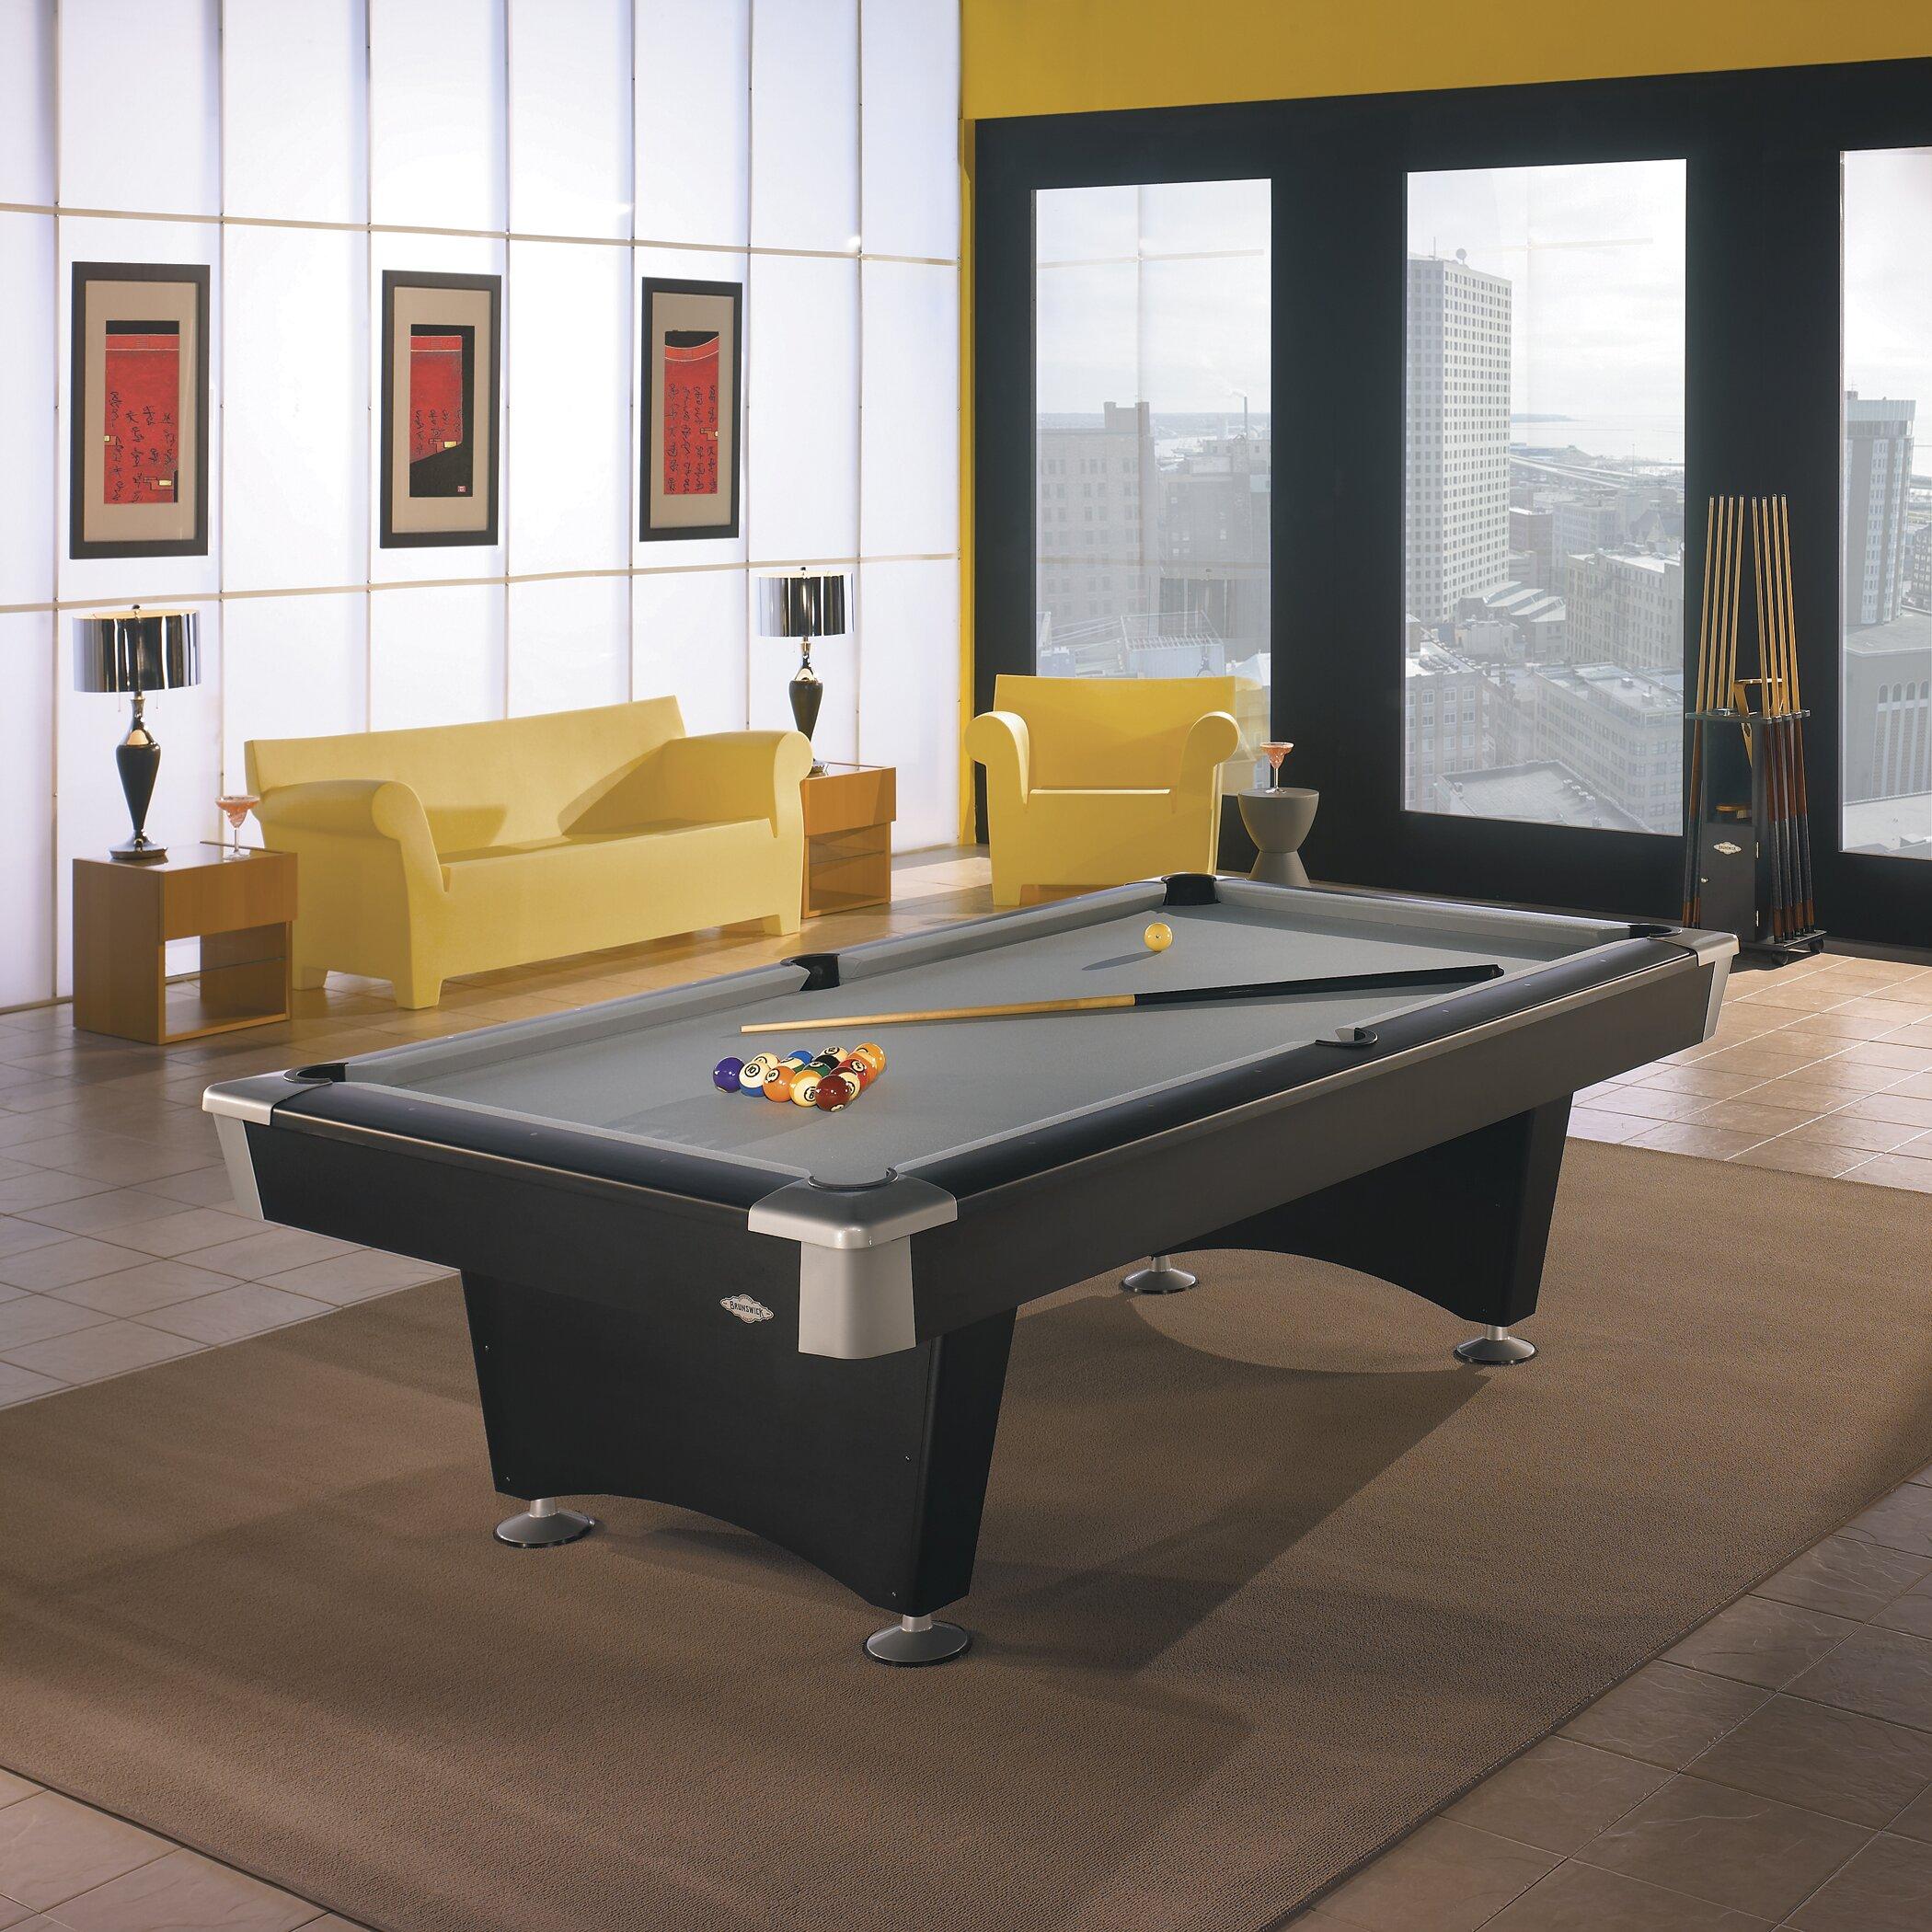 Brunswick Pool Table Images Brunswick Bridgeport Ft Pool - Brunswick chateau pool table